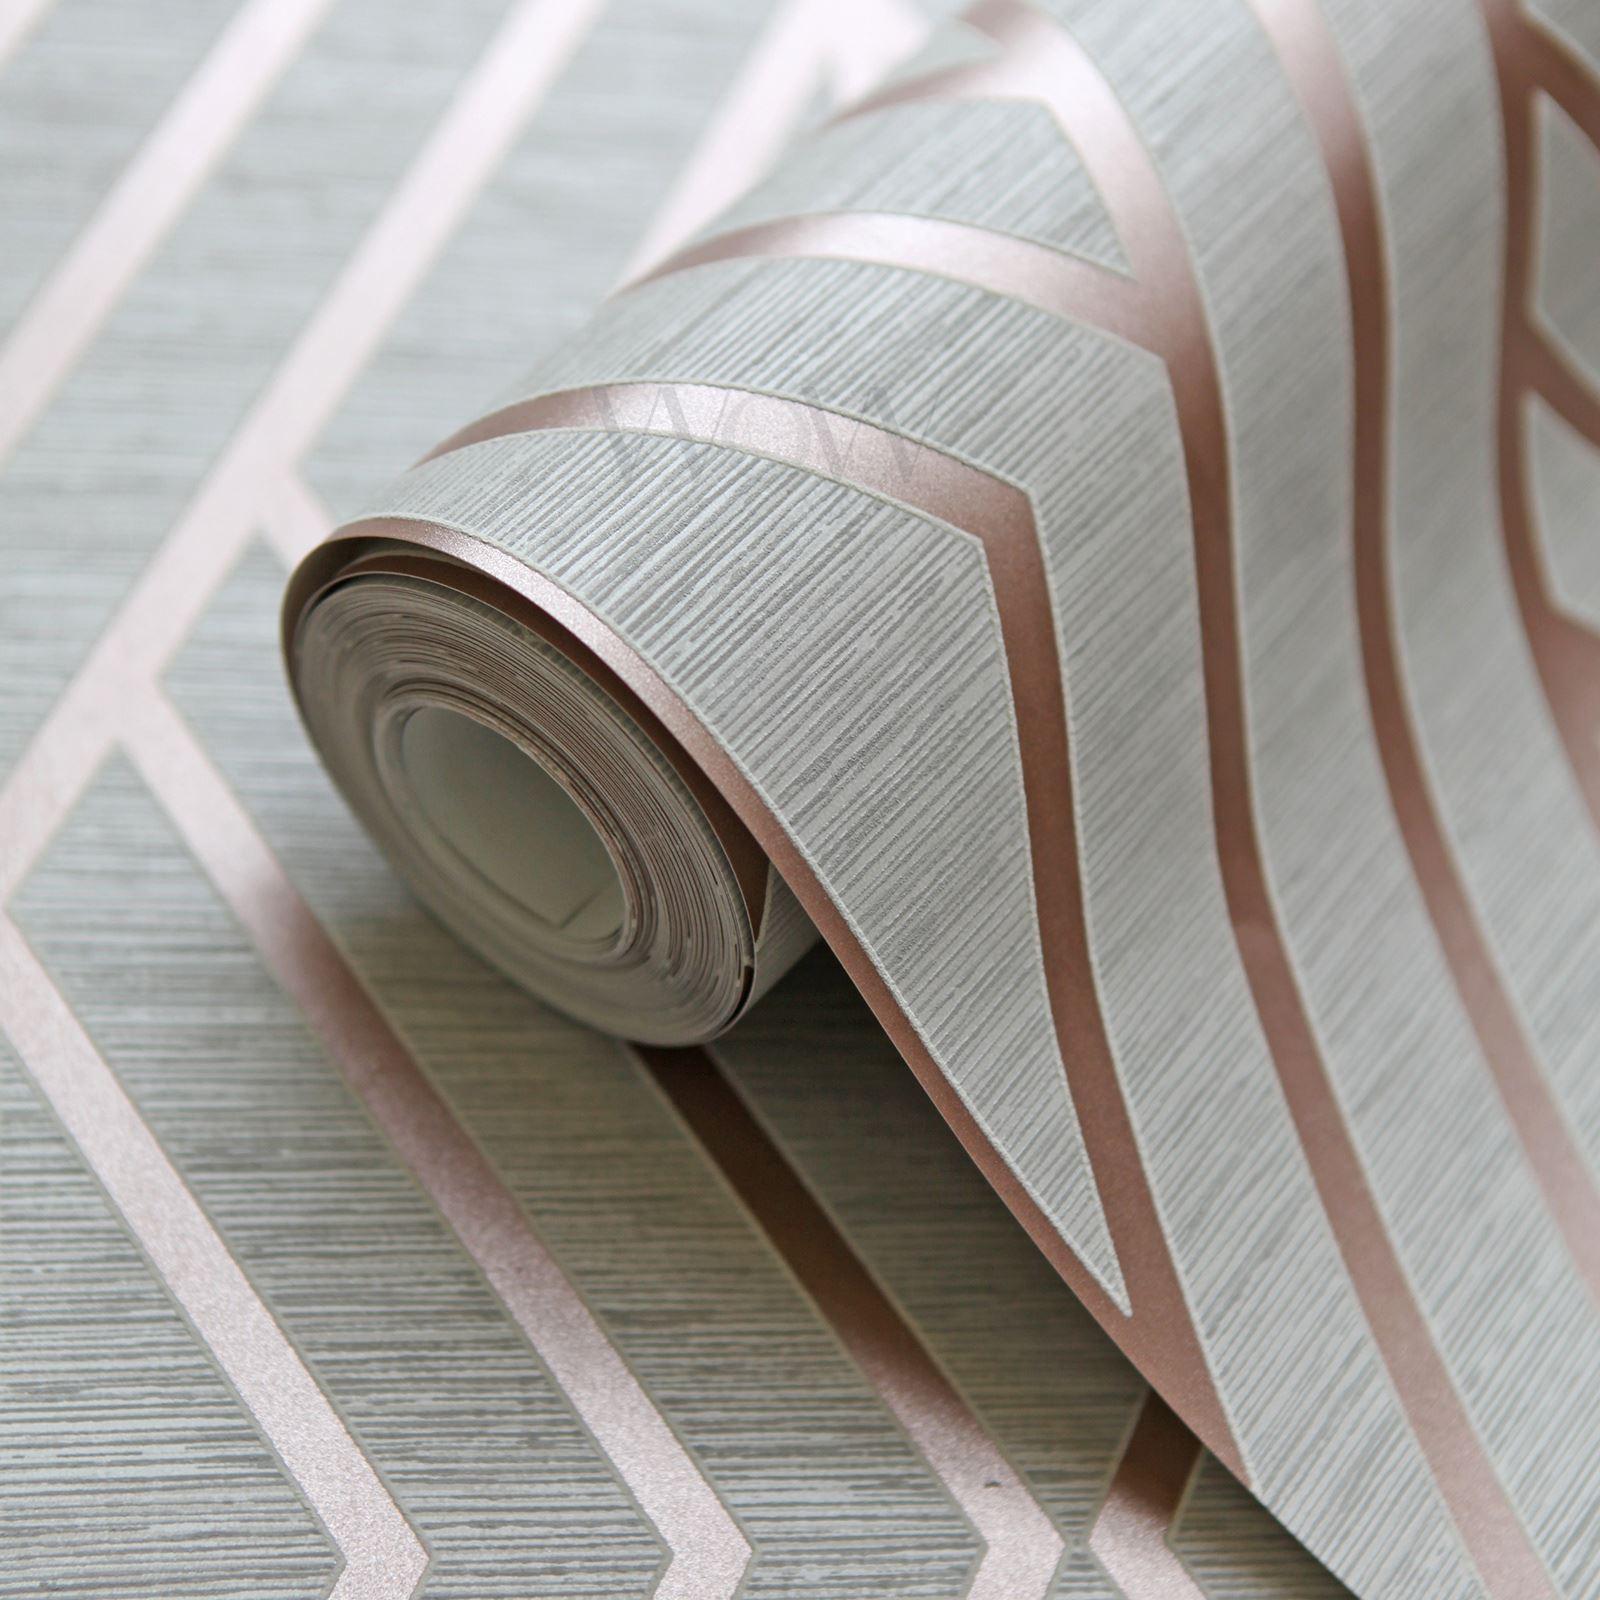 miniatura 57 - Carta da Parati Geometrica Arredamento Camera Moderno Vari Disegni e Colori